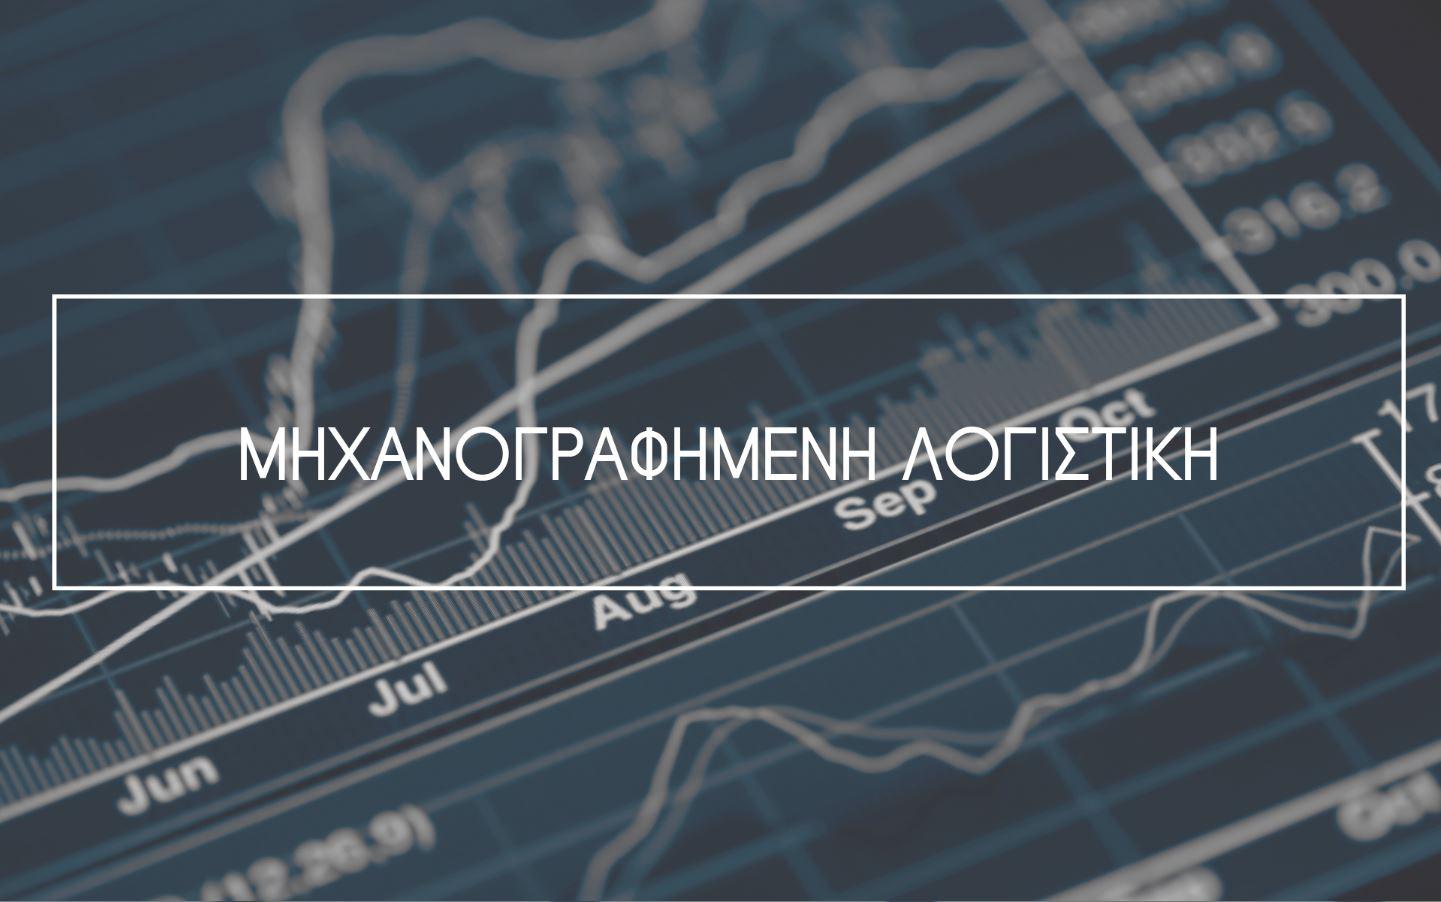 maxanogrfimenh-logisdtikh-1